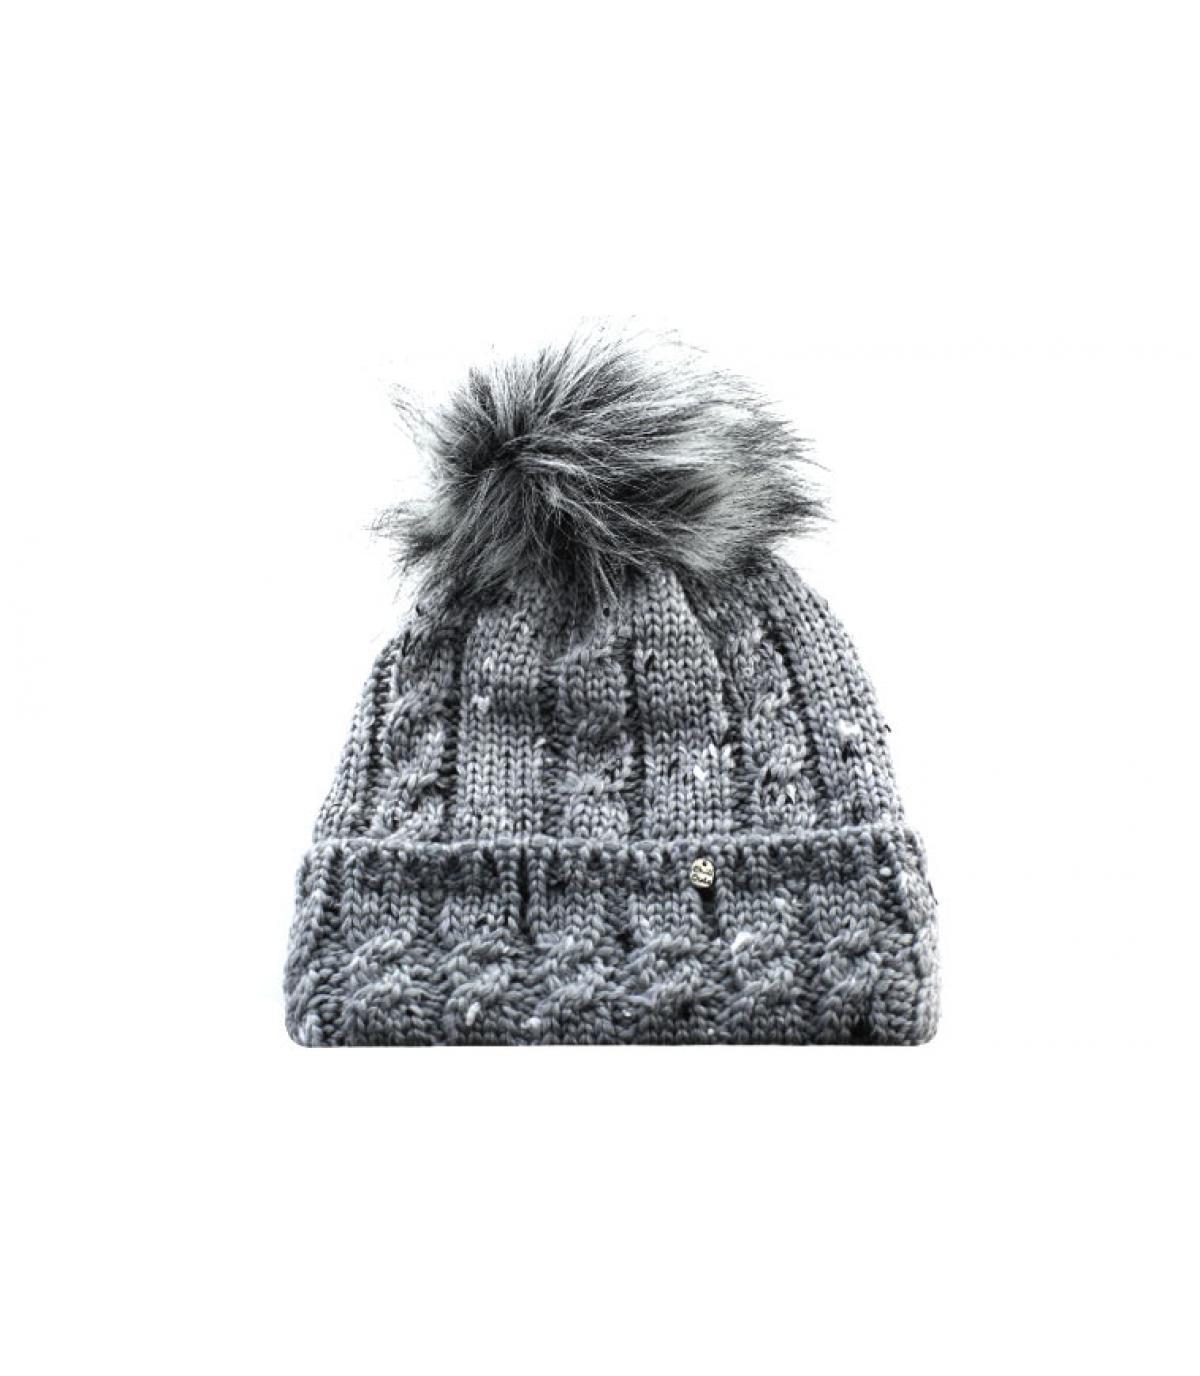 9edc2f2e4d3026 grey beanie pompom - Roxanne Hat dark grey by Chillouts. Headict